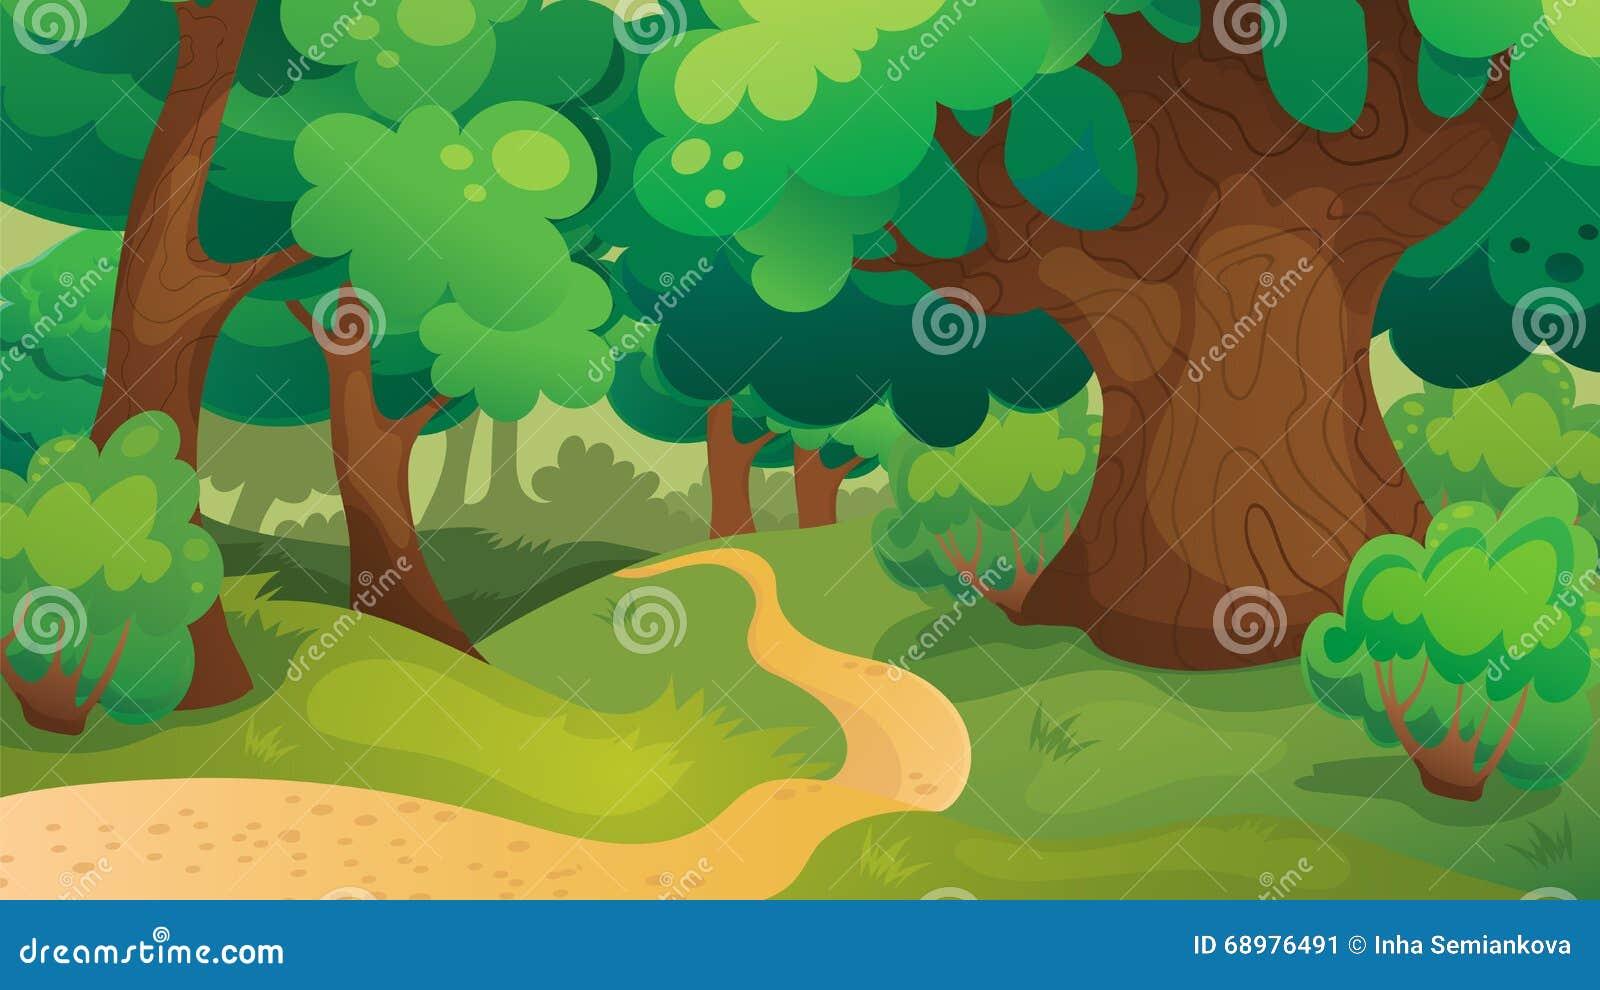 Oak Forest Game Background